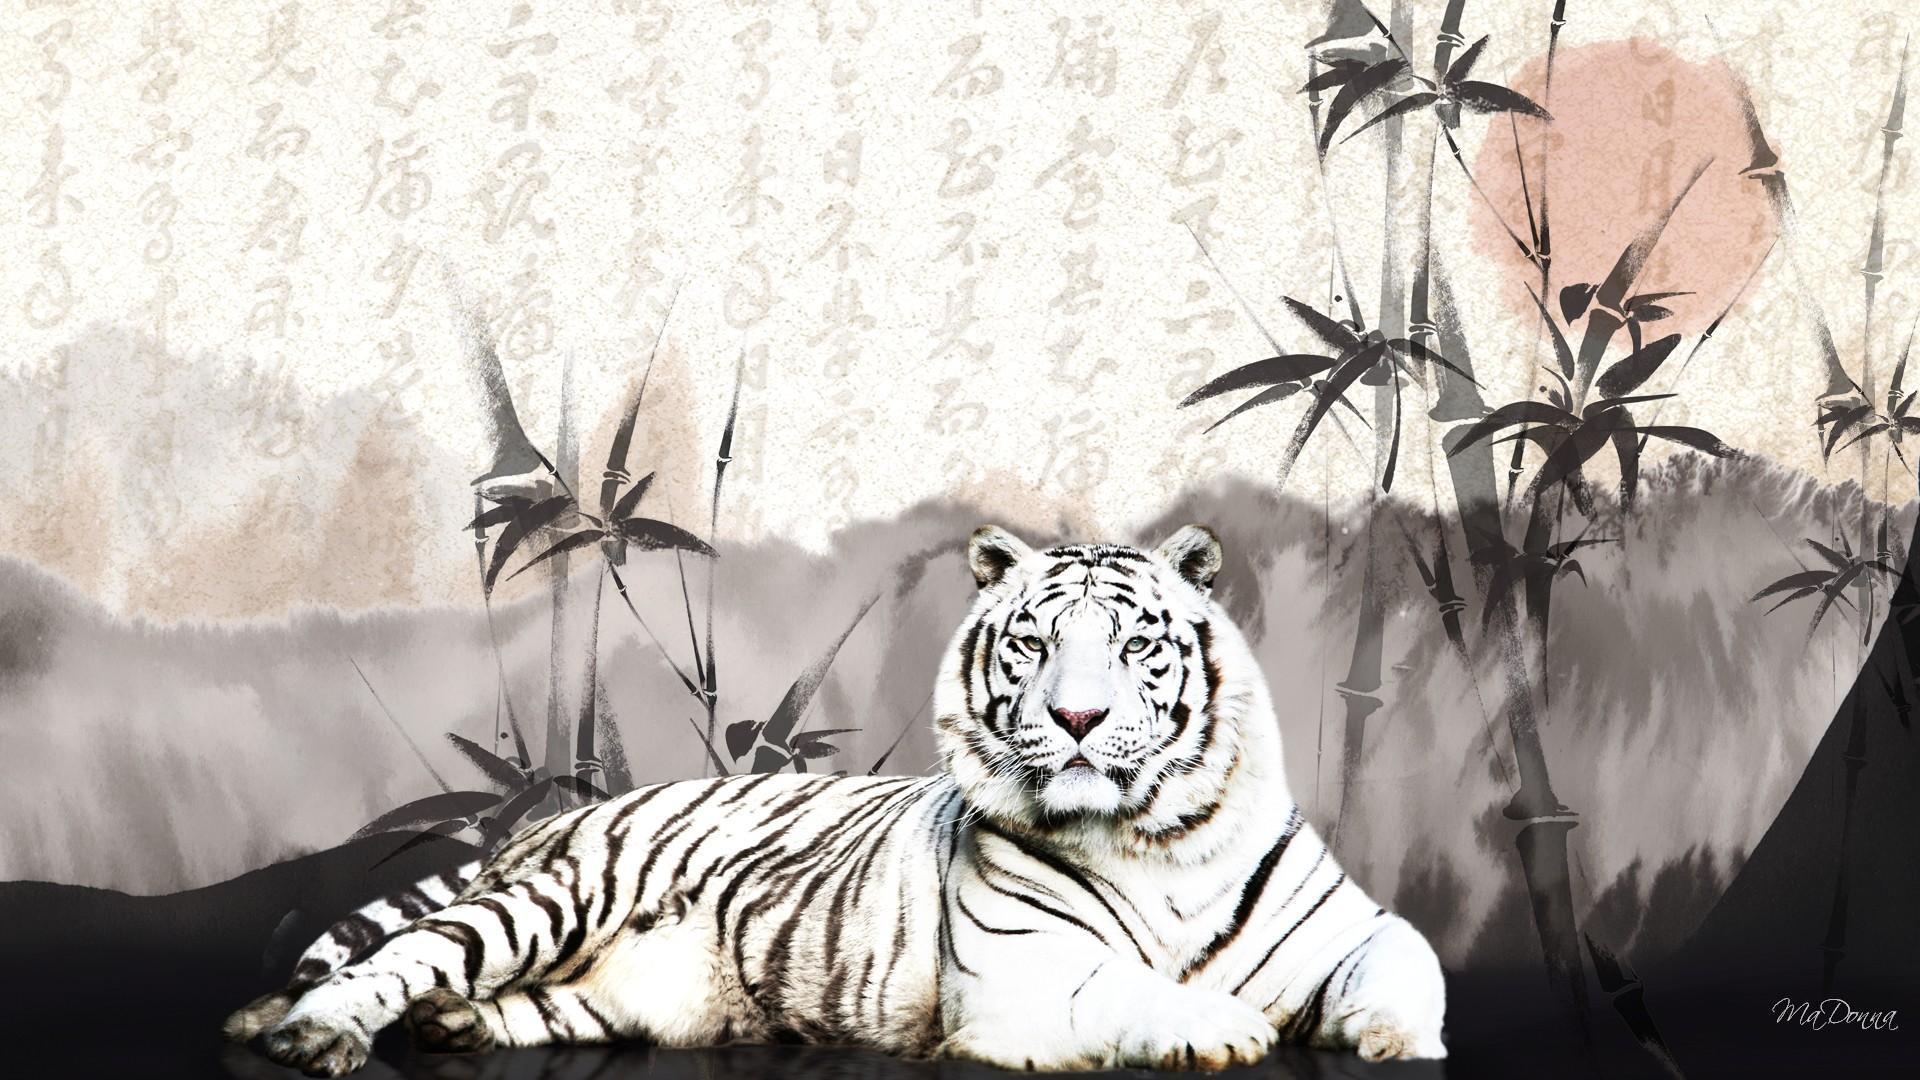 Oriental Desktop Wallpapers - Top Free Oriental Desktop